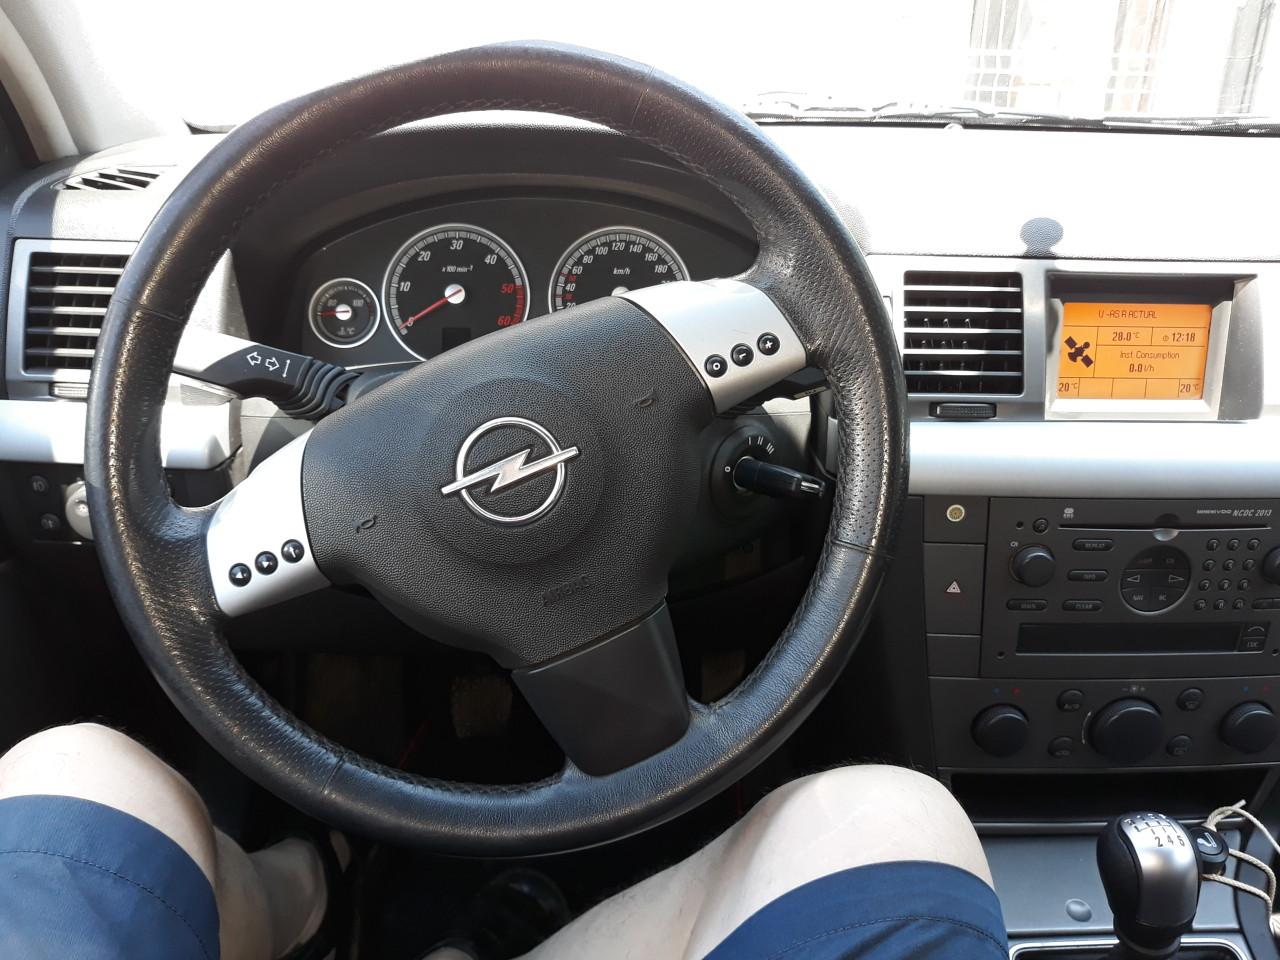 Opel Vectra 1.9 cdti 2004